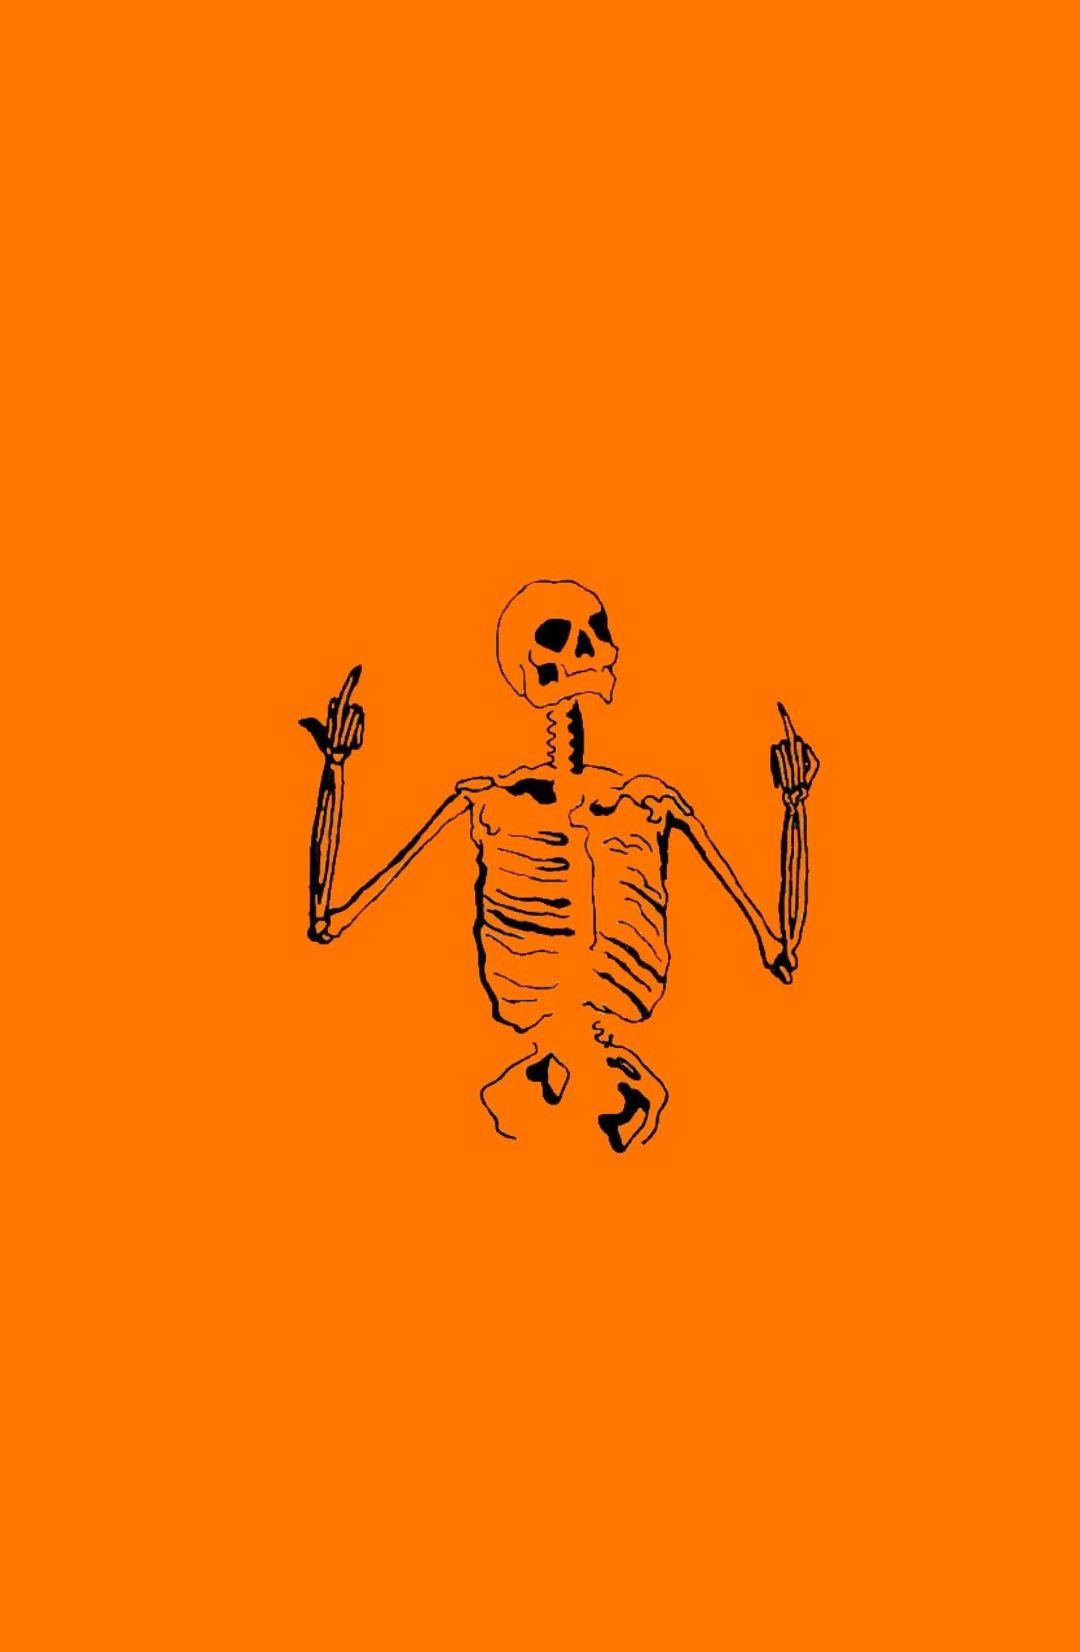 Halloween Wallpaper Tumblr Posted By John Thompson